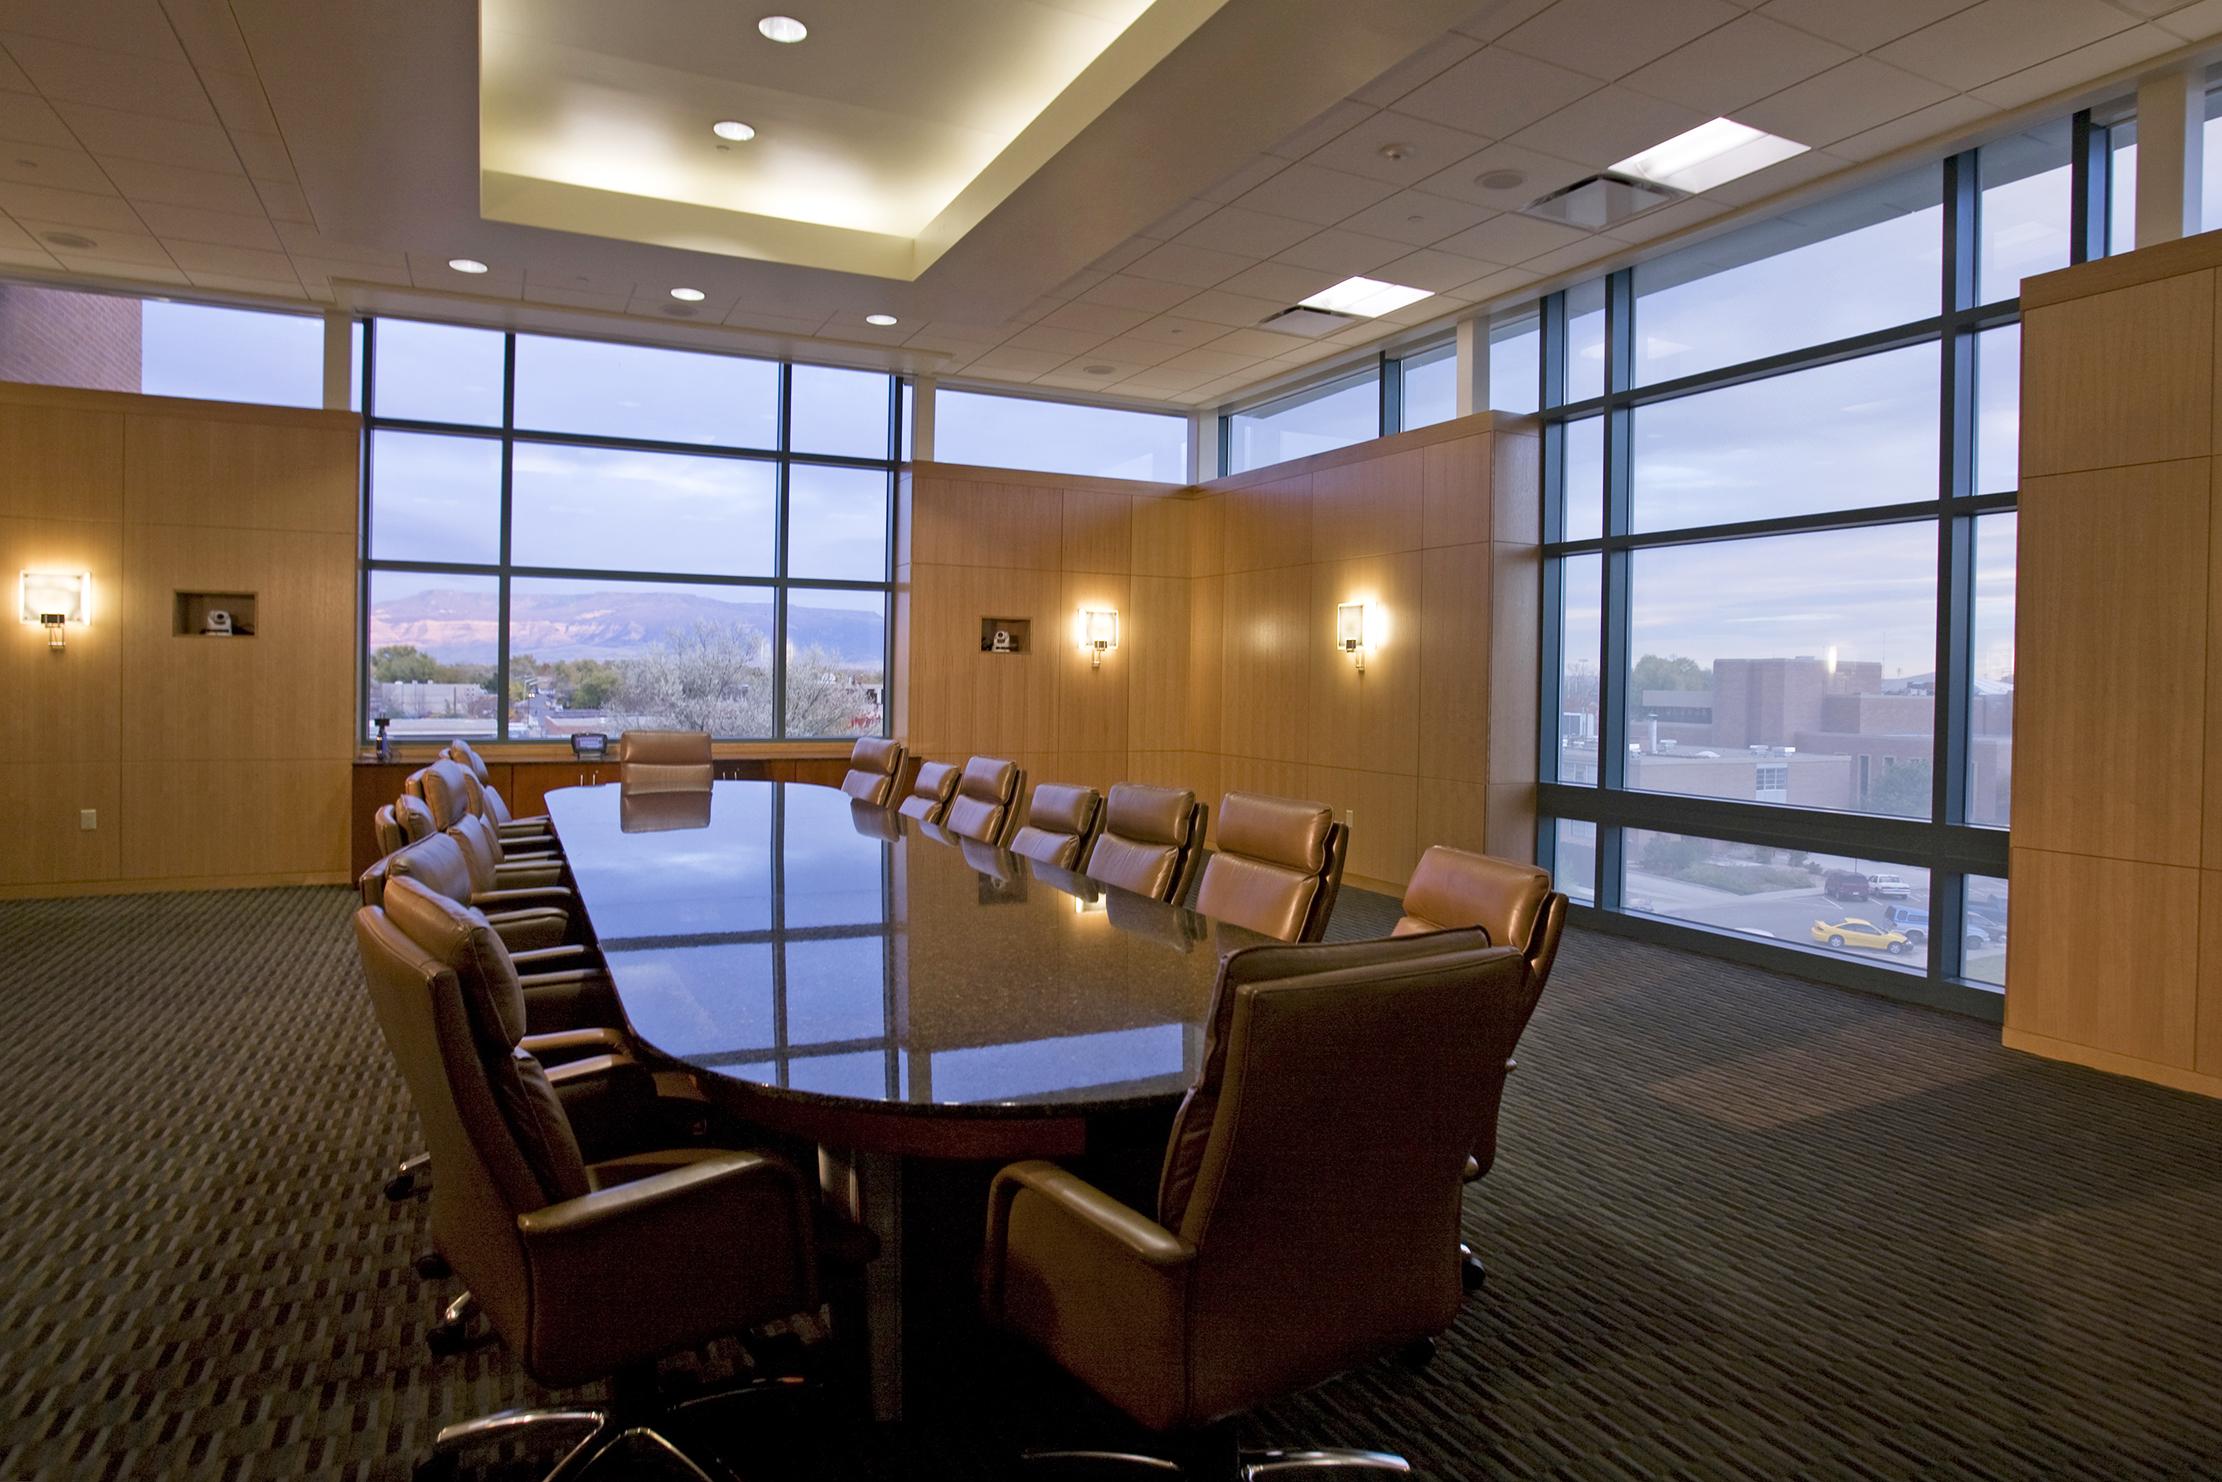 Dominguez Hall Conference Room - Colorado Mesa University - Grand Junction, CO